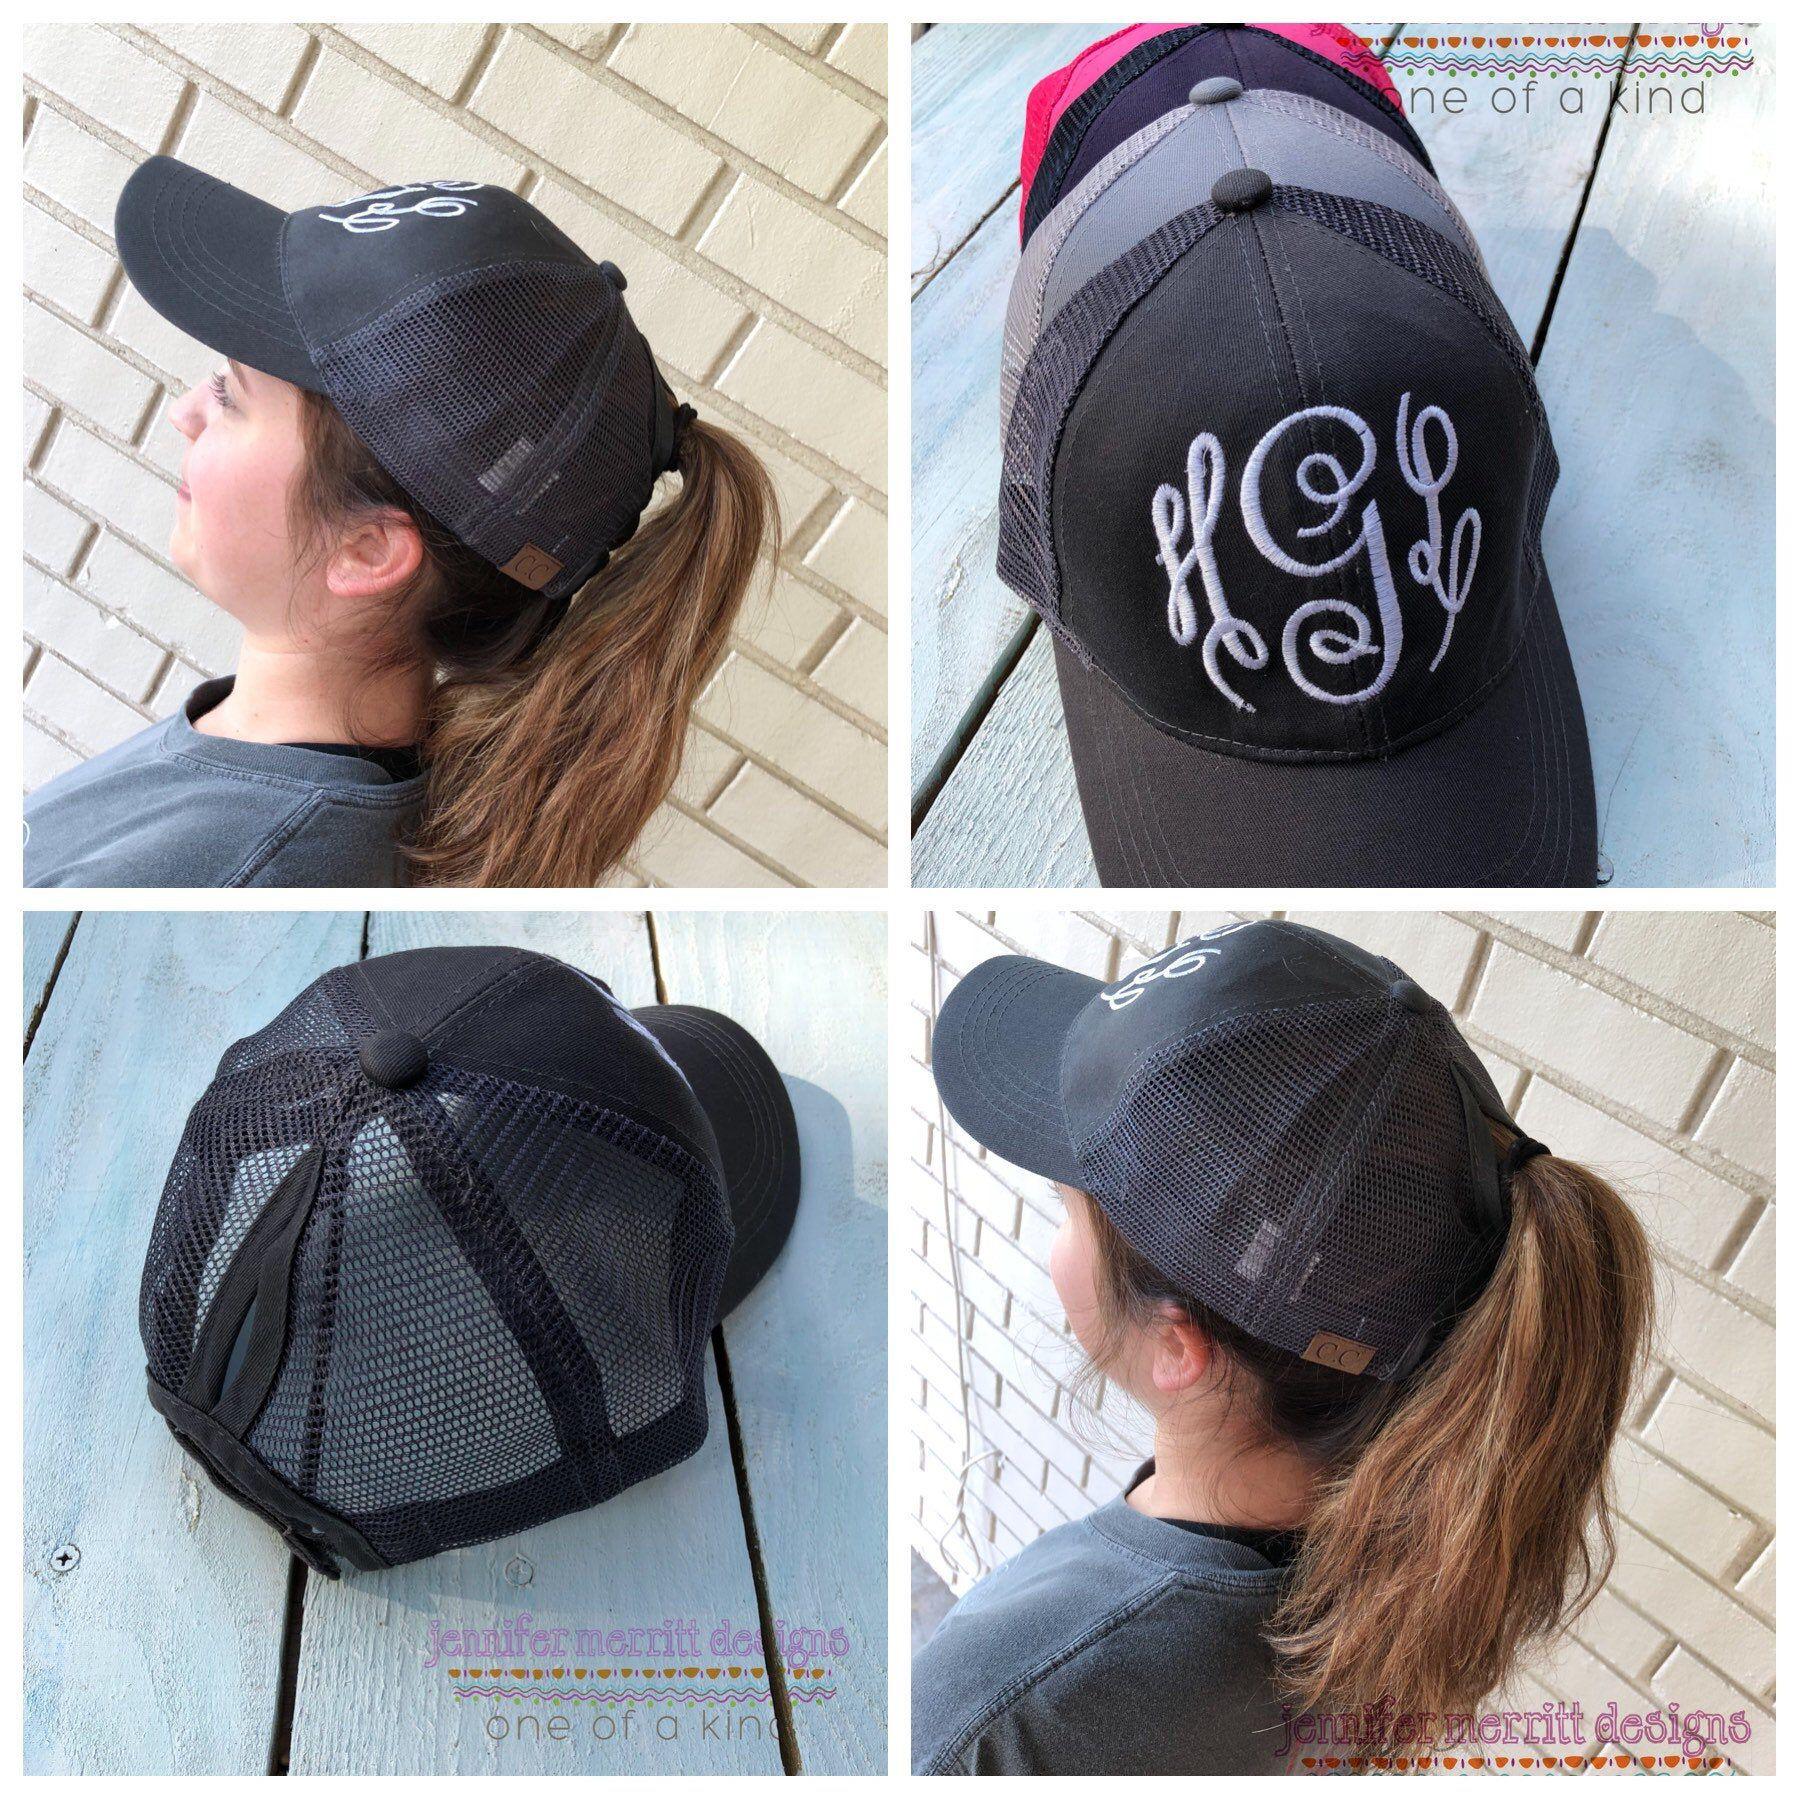 792b622a3 Ponytail Hat, High Ponytail Cap, Monogram Ponytail Hat, Messy Bun ...